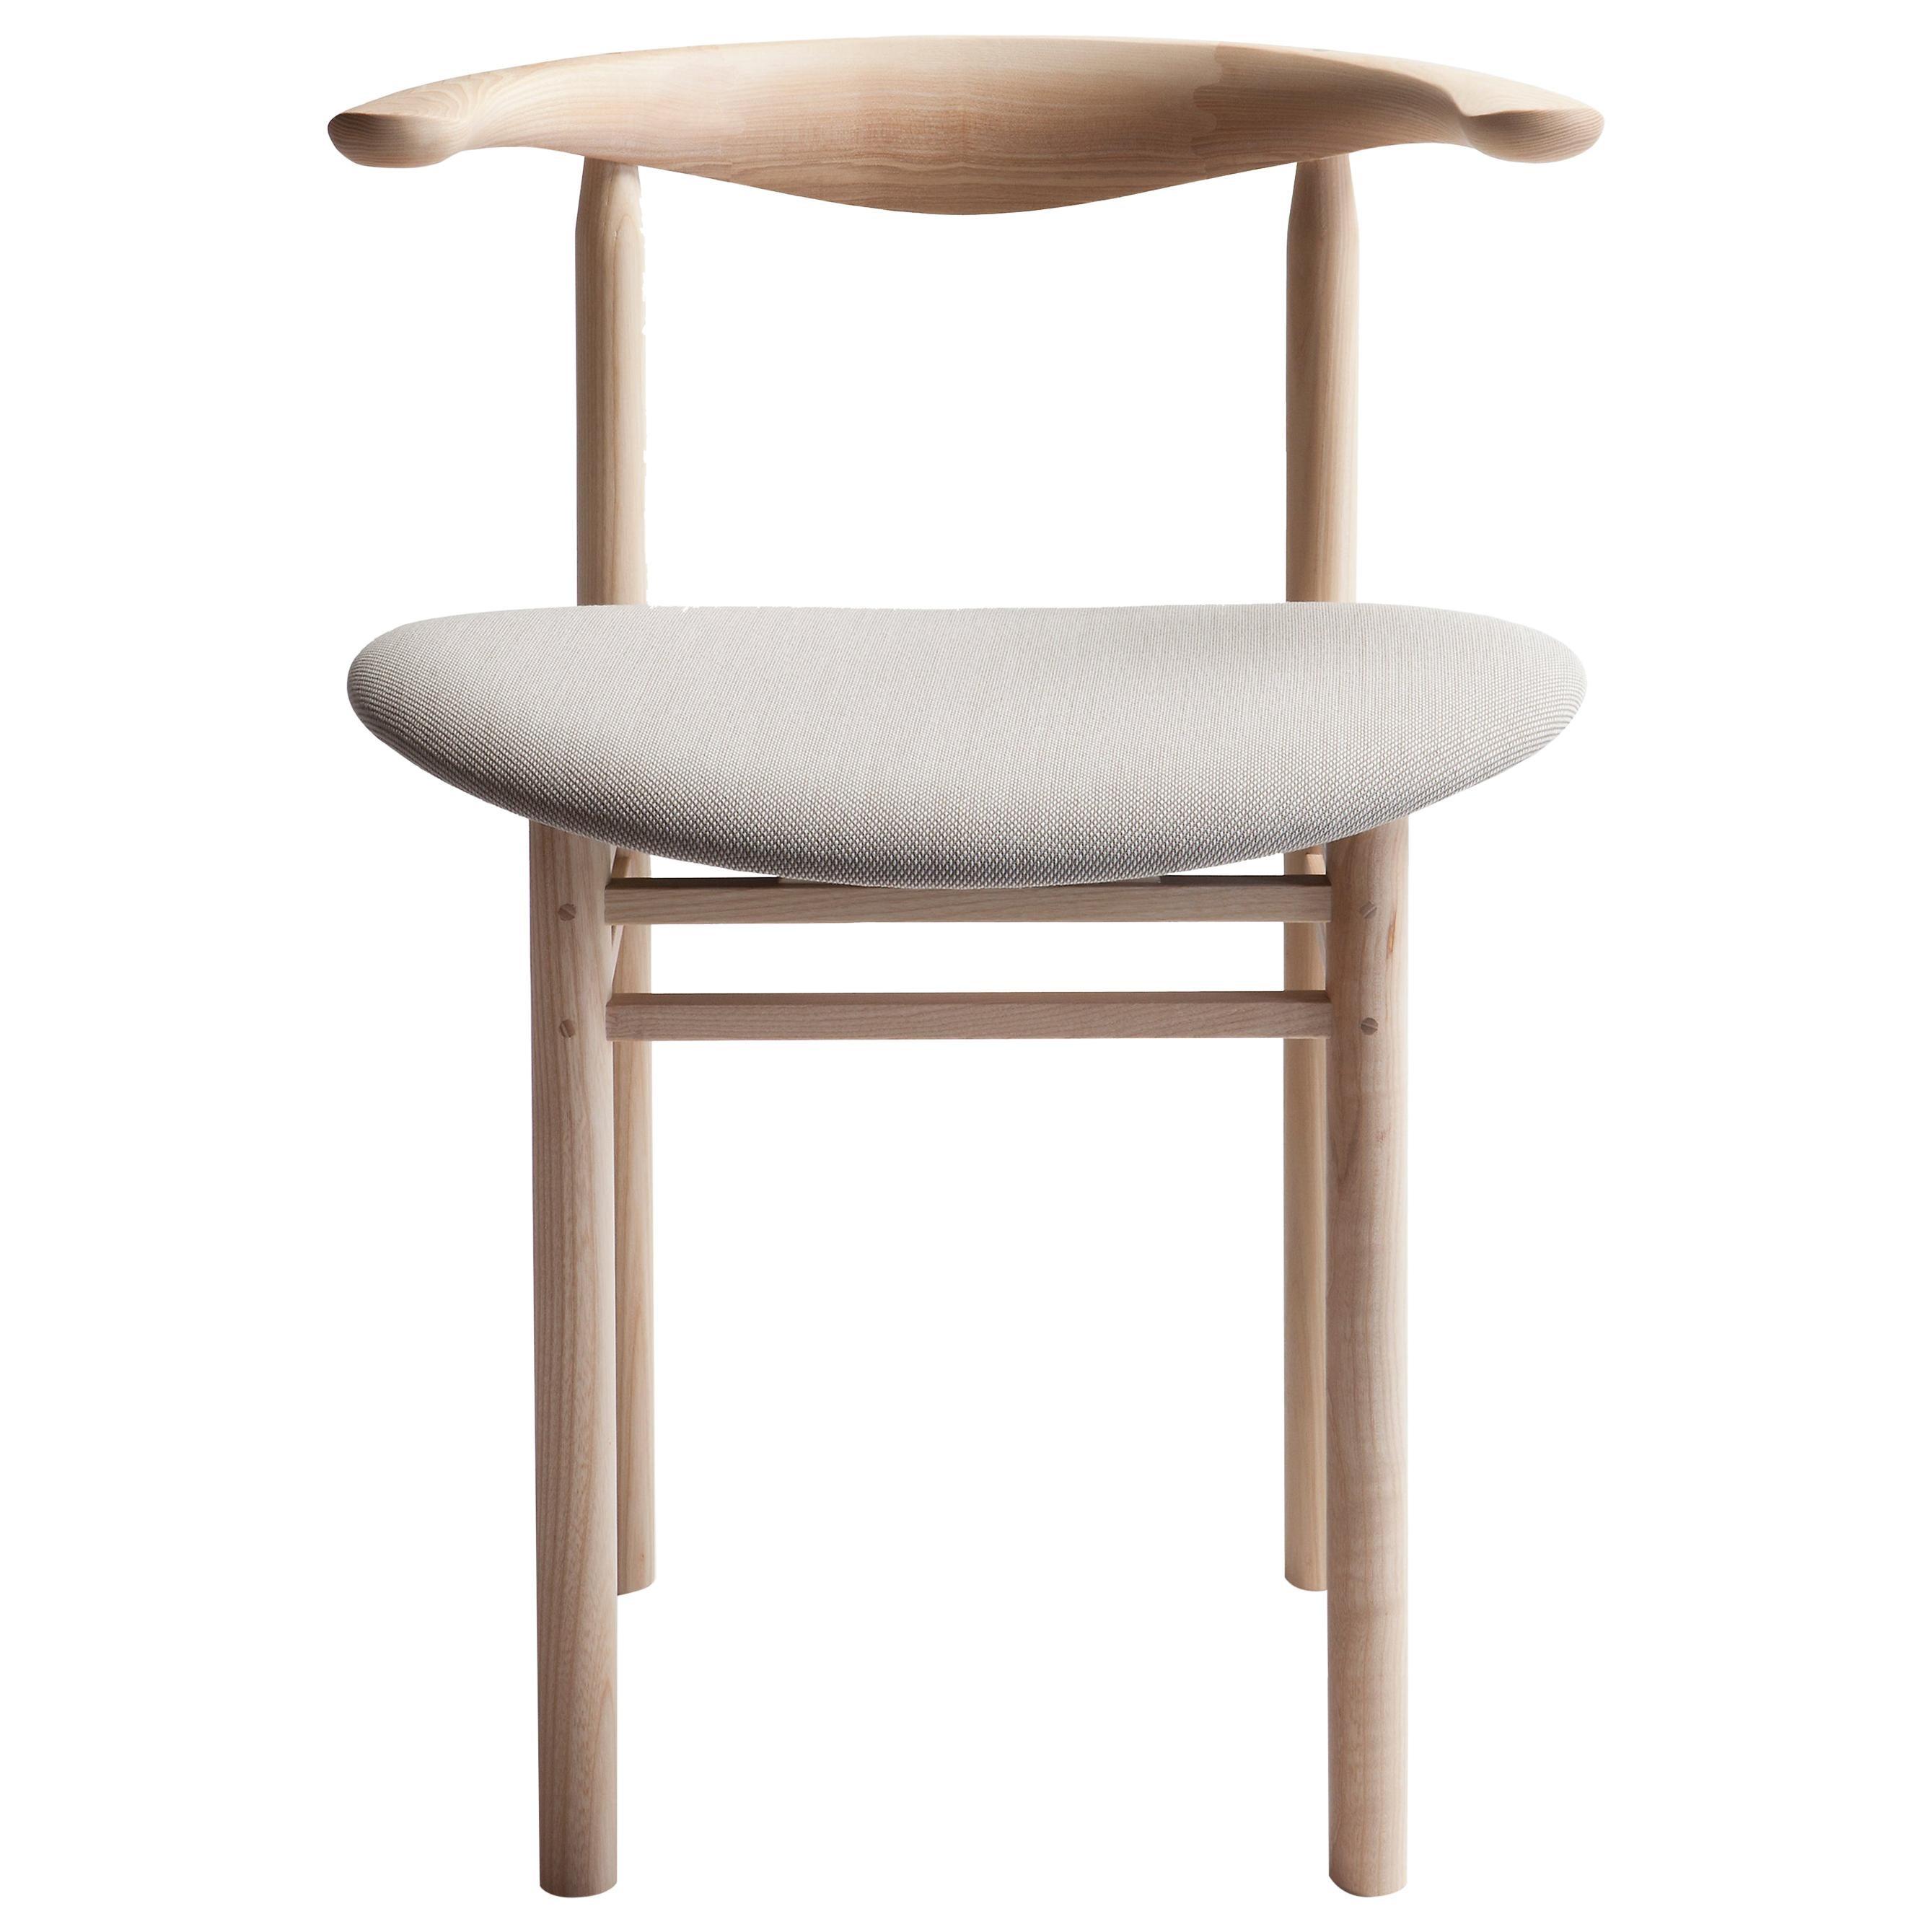 Linea RMT3 Chair in Ash by Rudi Merz